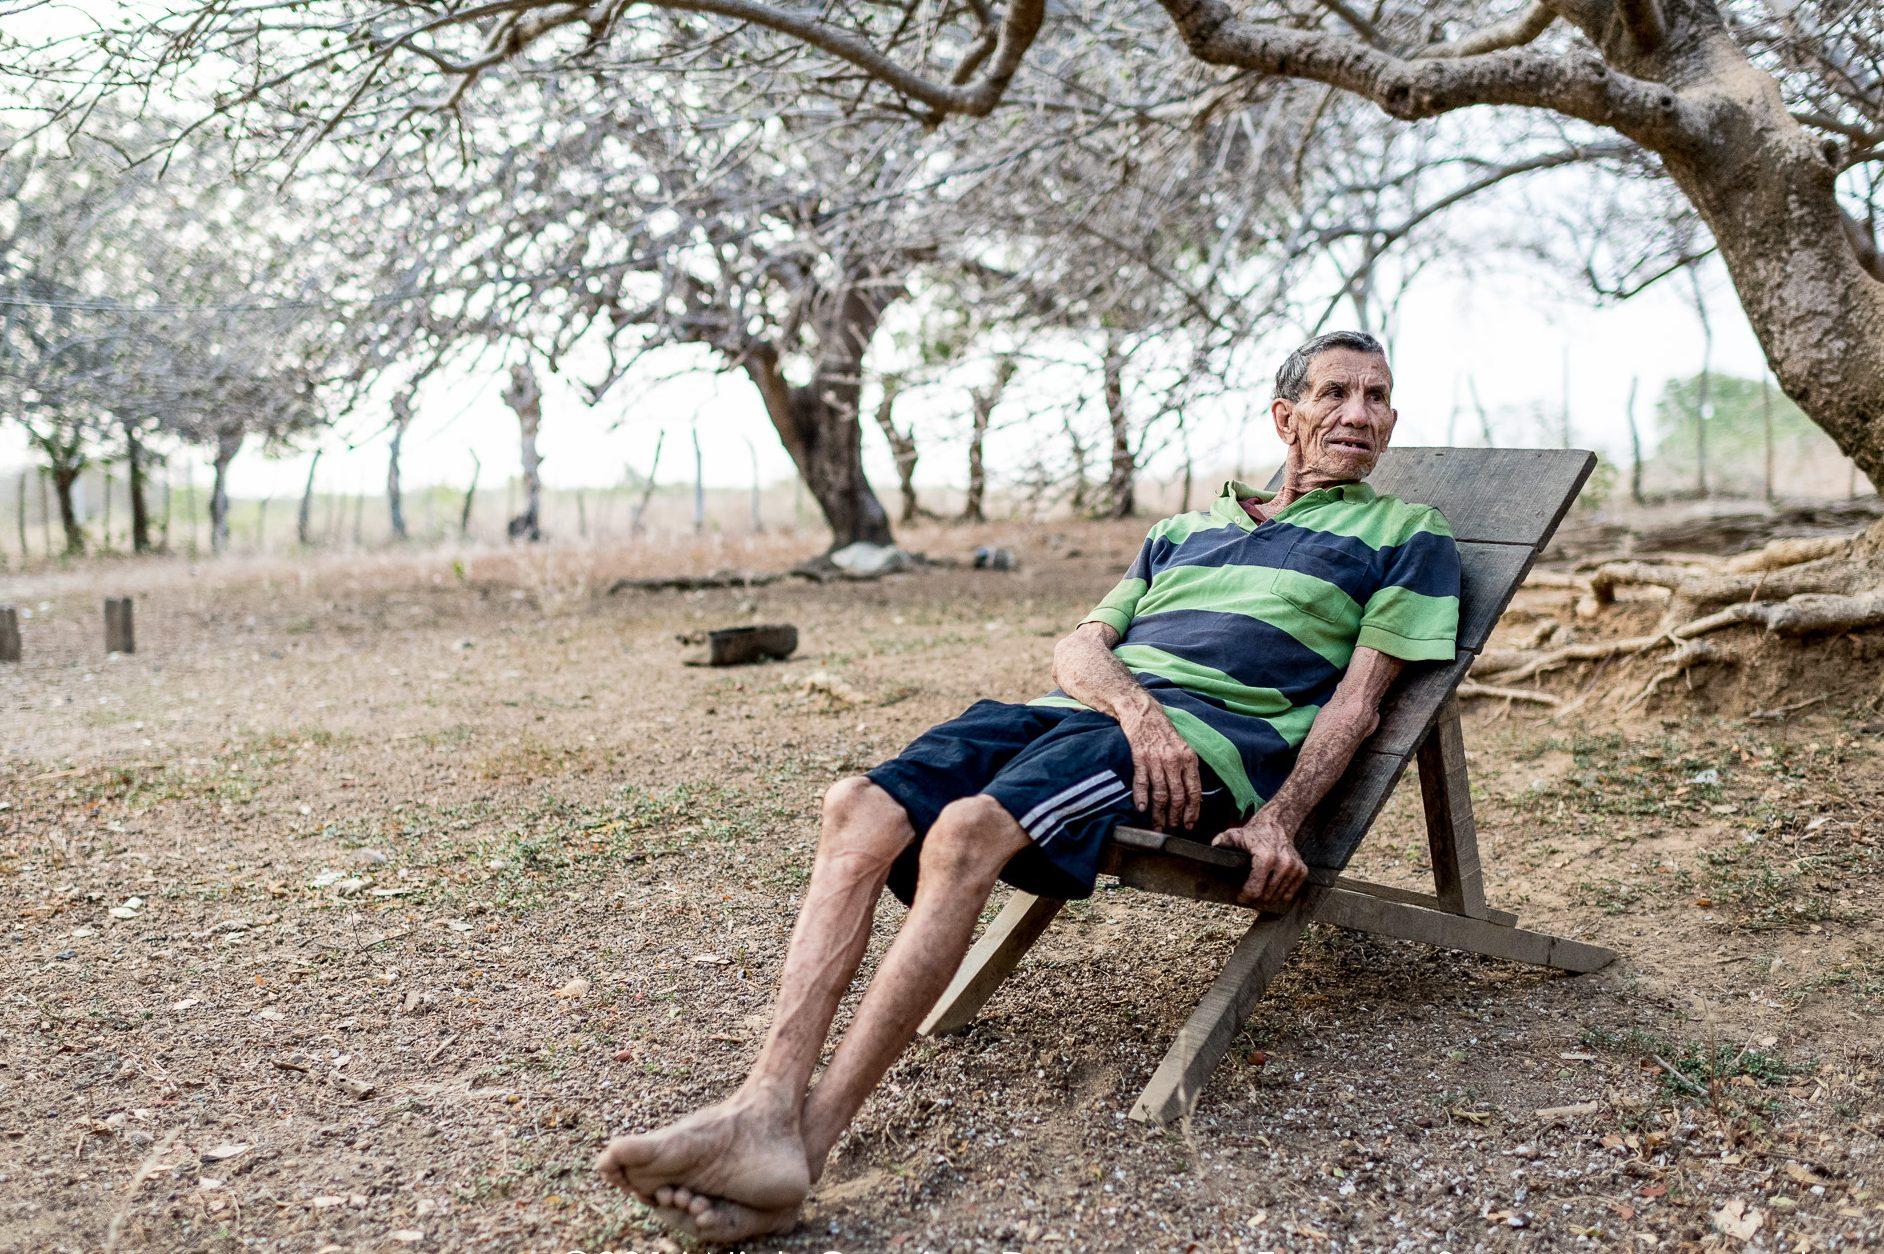 Colombia April 2016 - Part 3: Stories from Juan de Acosta